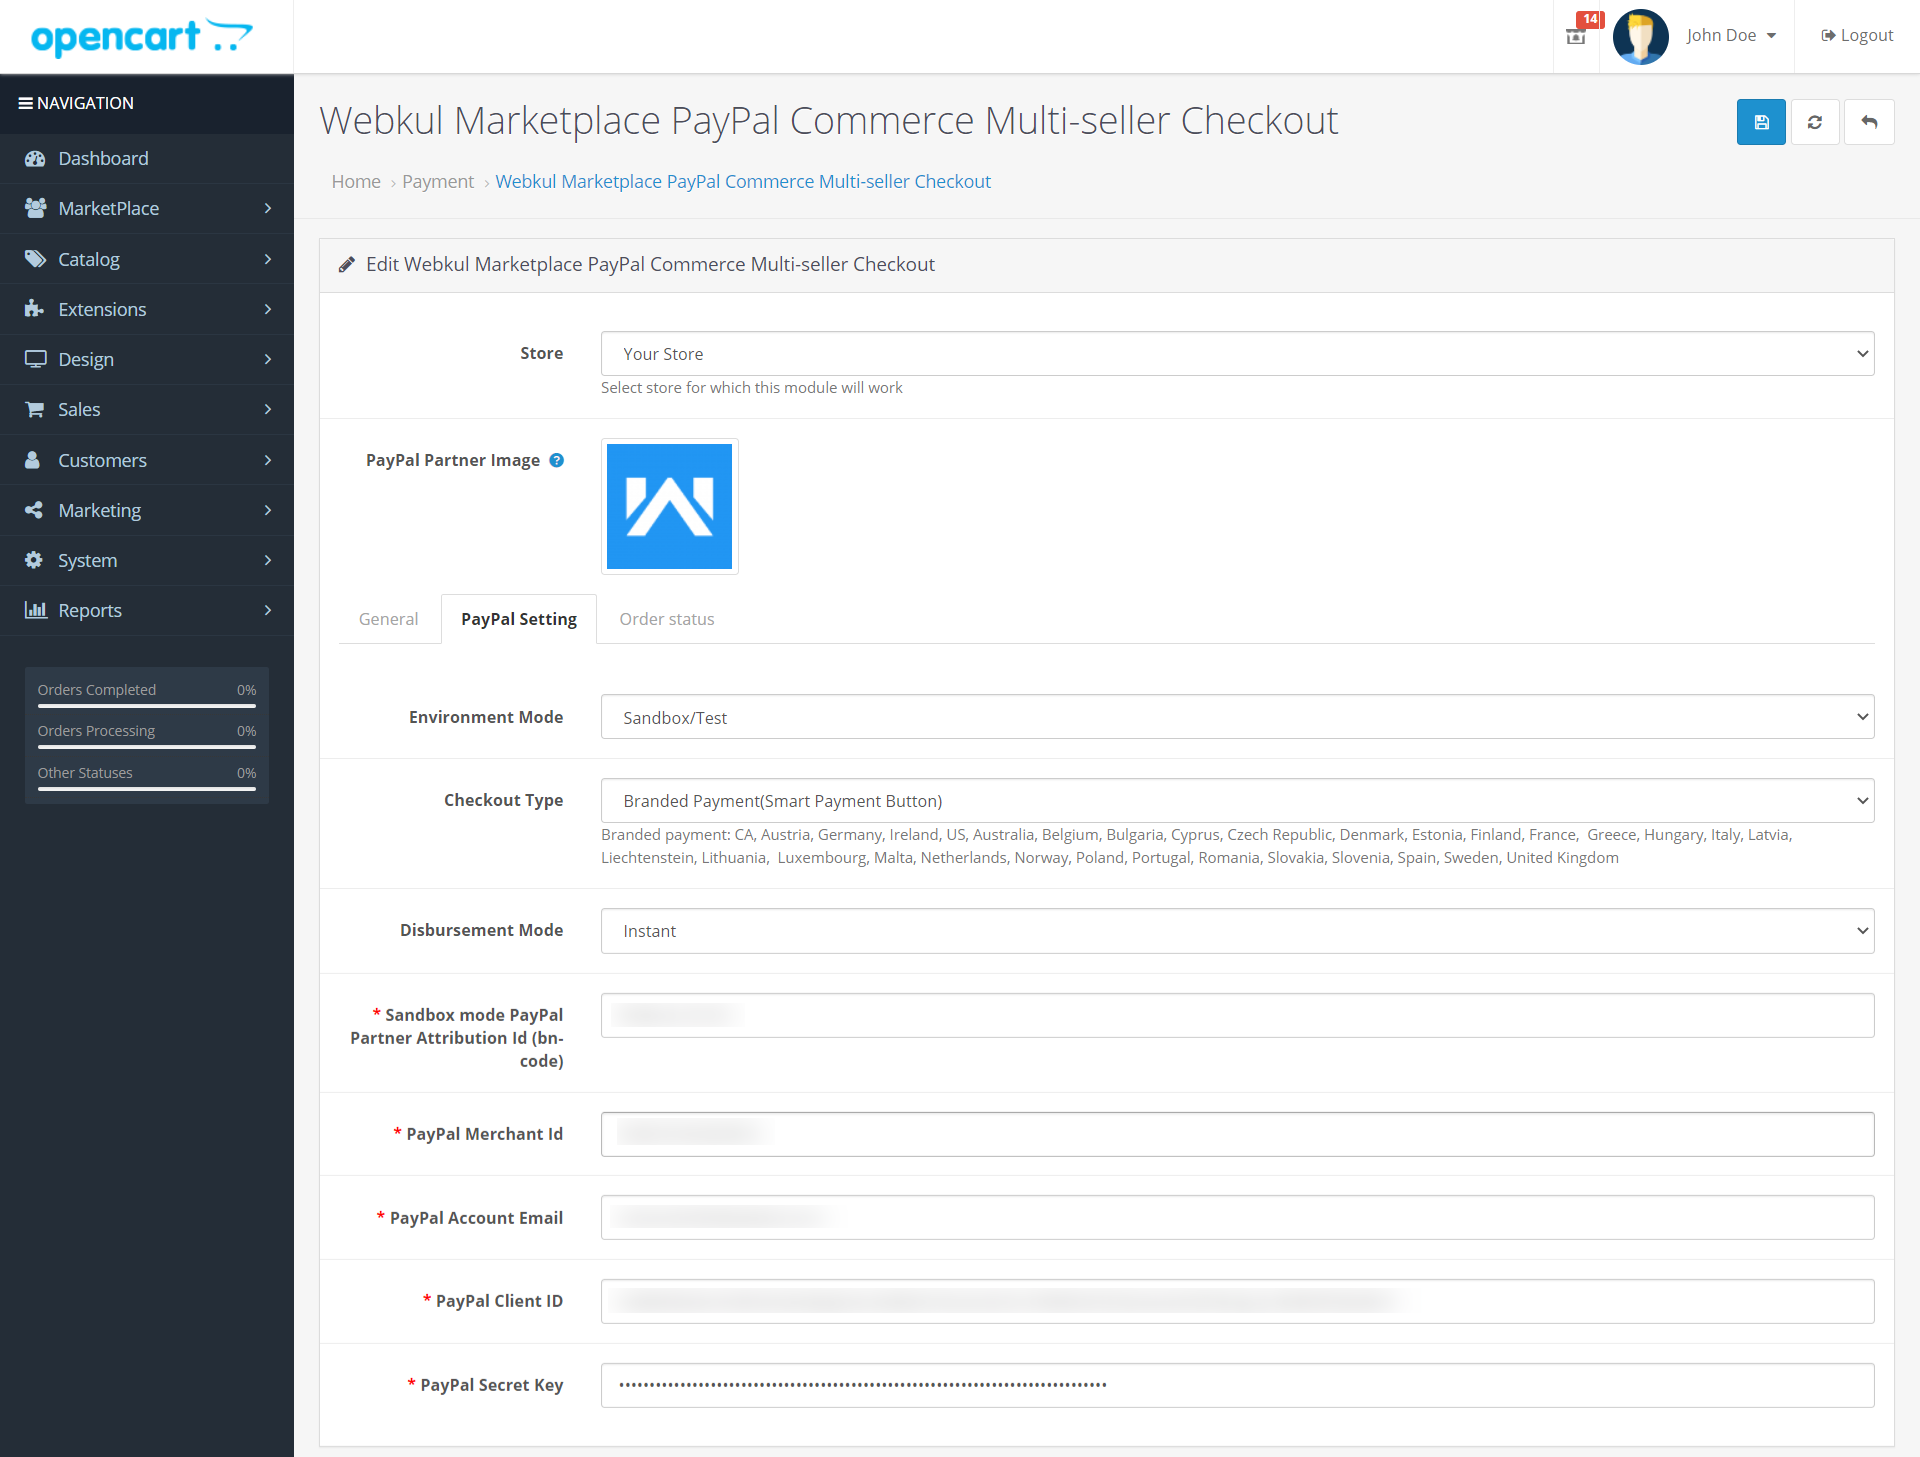 Webkul-Marketplace-PayPal-Commerce-Multi-seller-Paypal-Setting